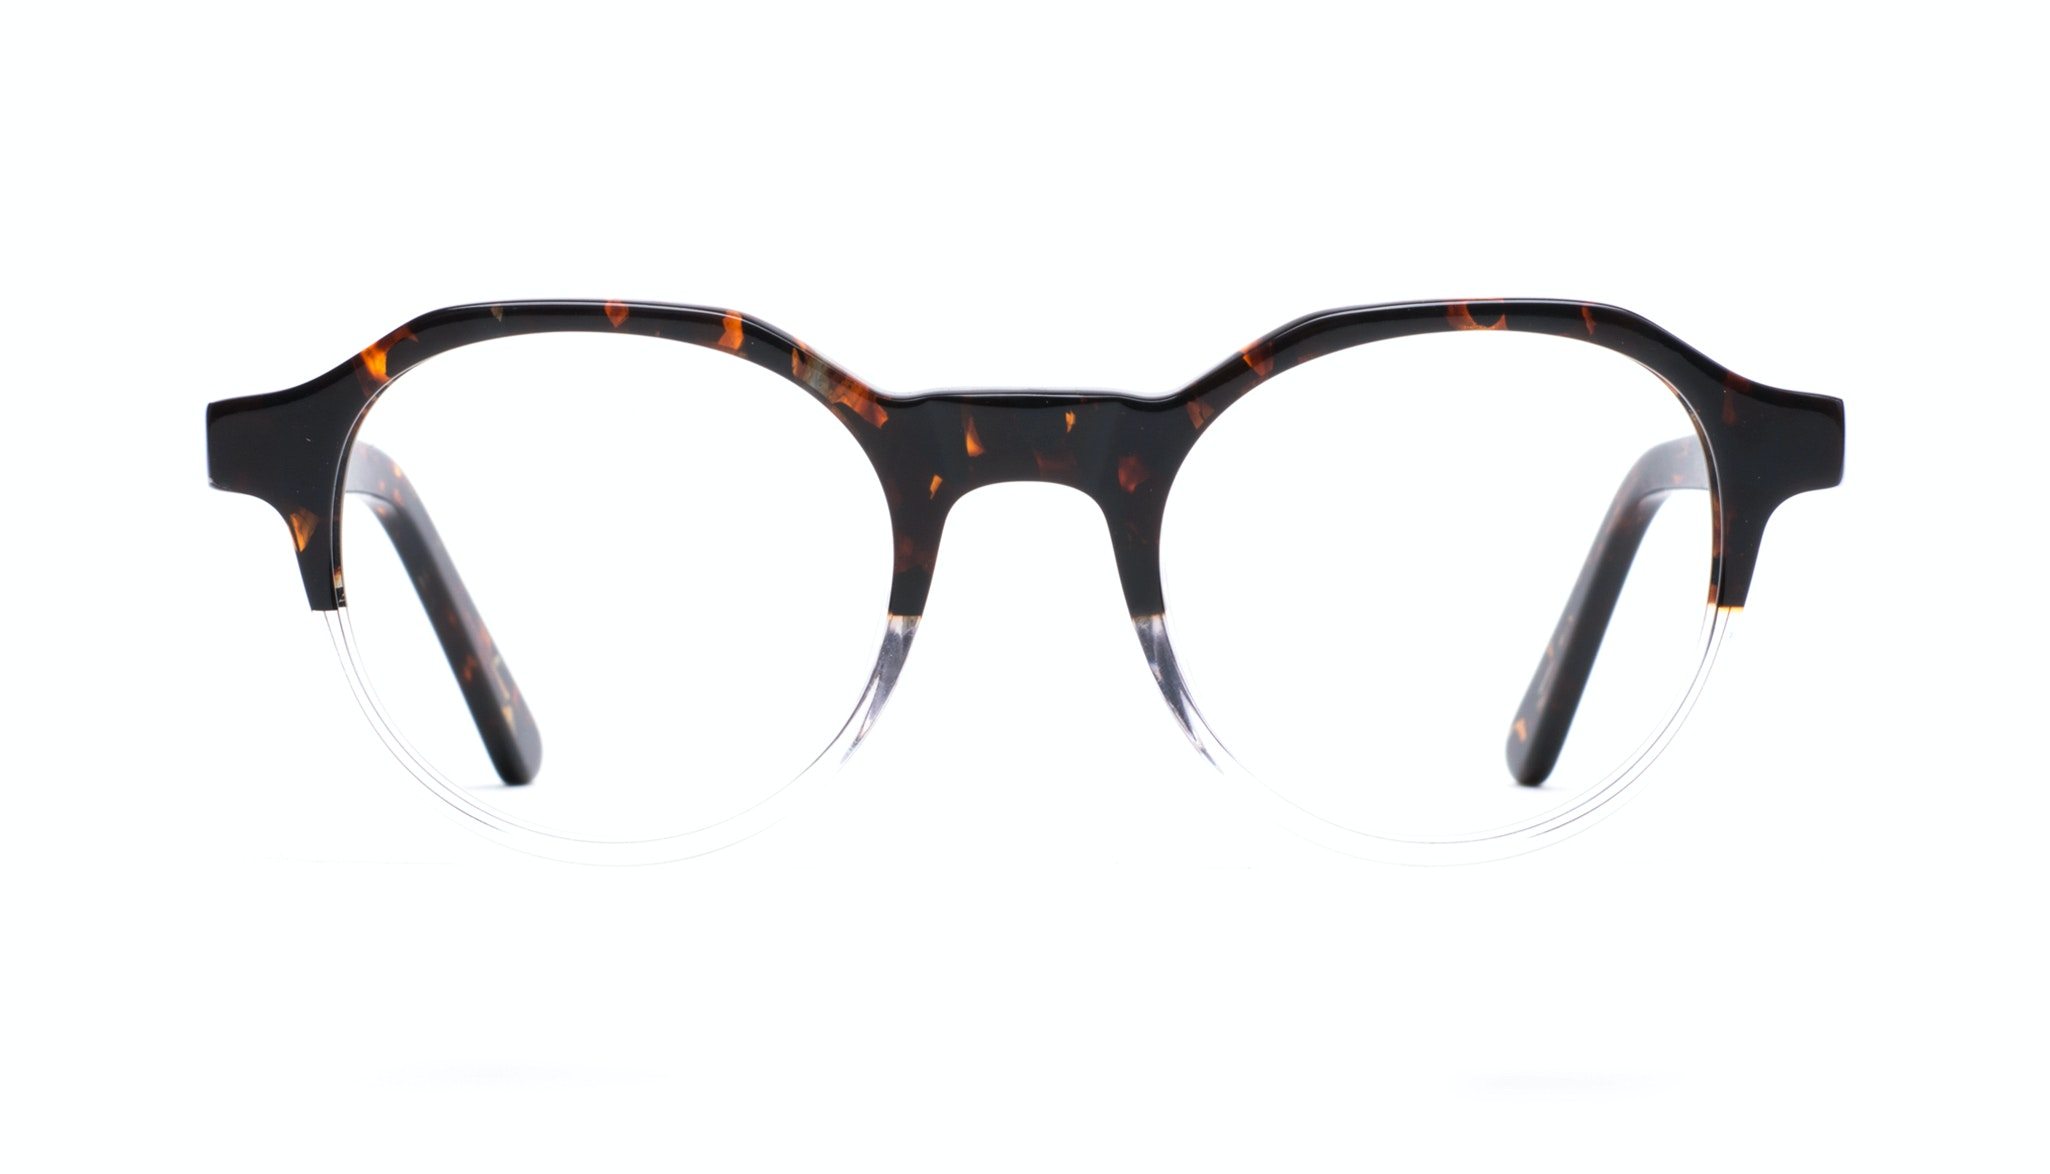 Affordable Fashion Glasses Round Eyeglasses Men Form Mahogany Clear